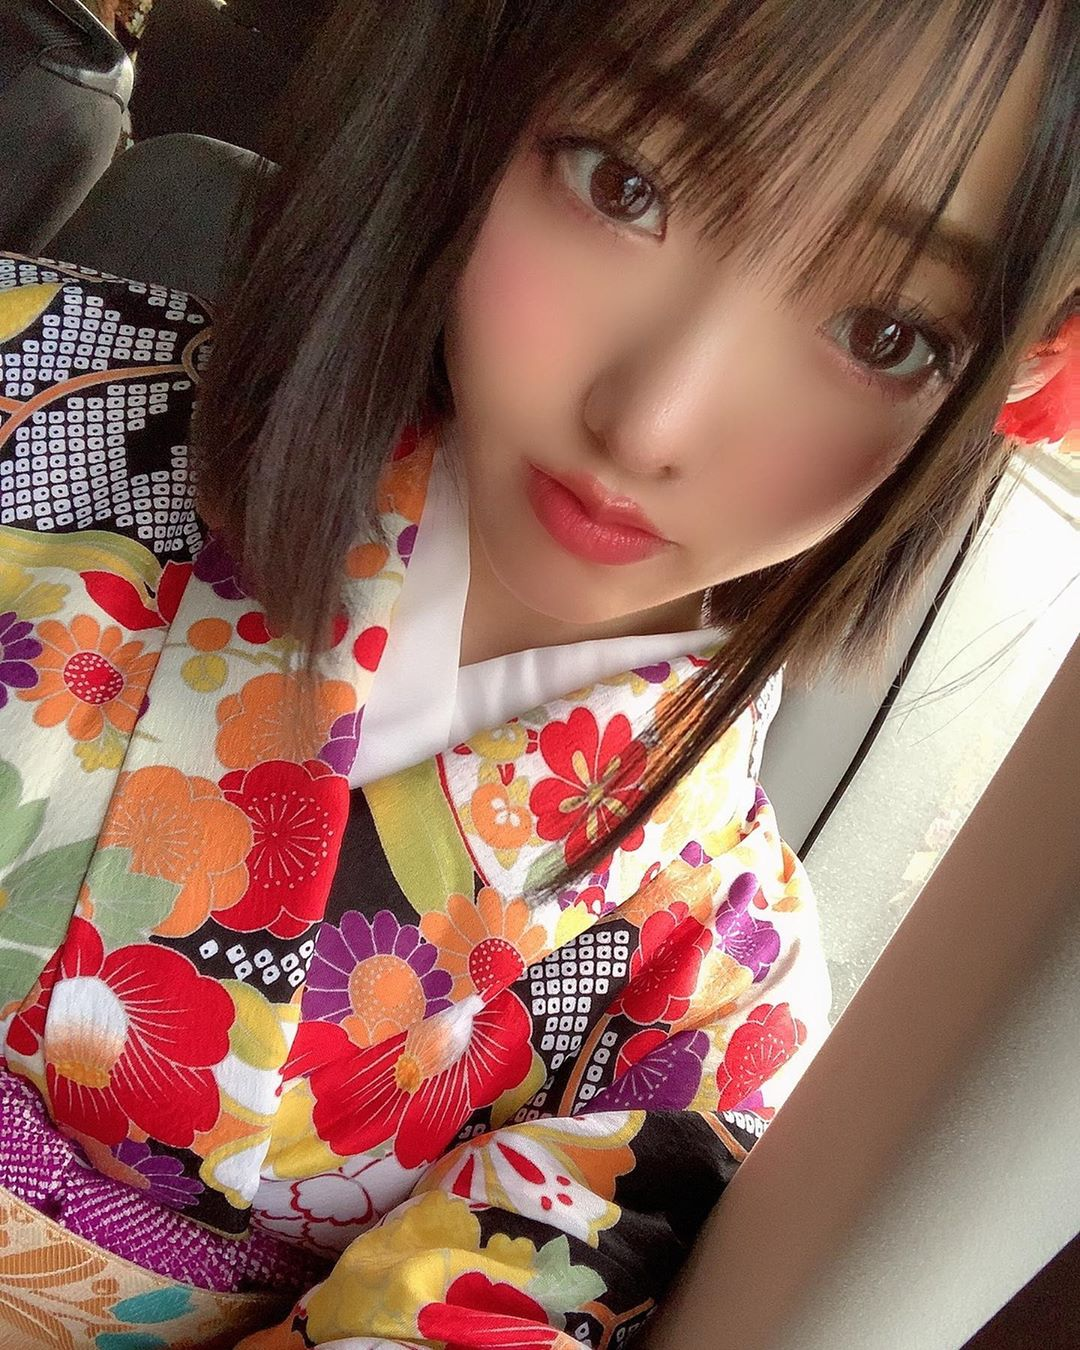 shiraishi_mizuho100.jpg